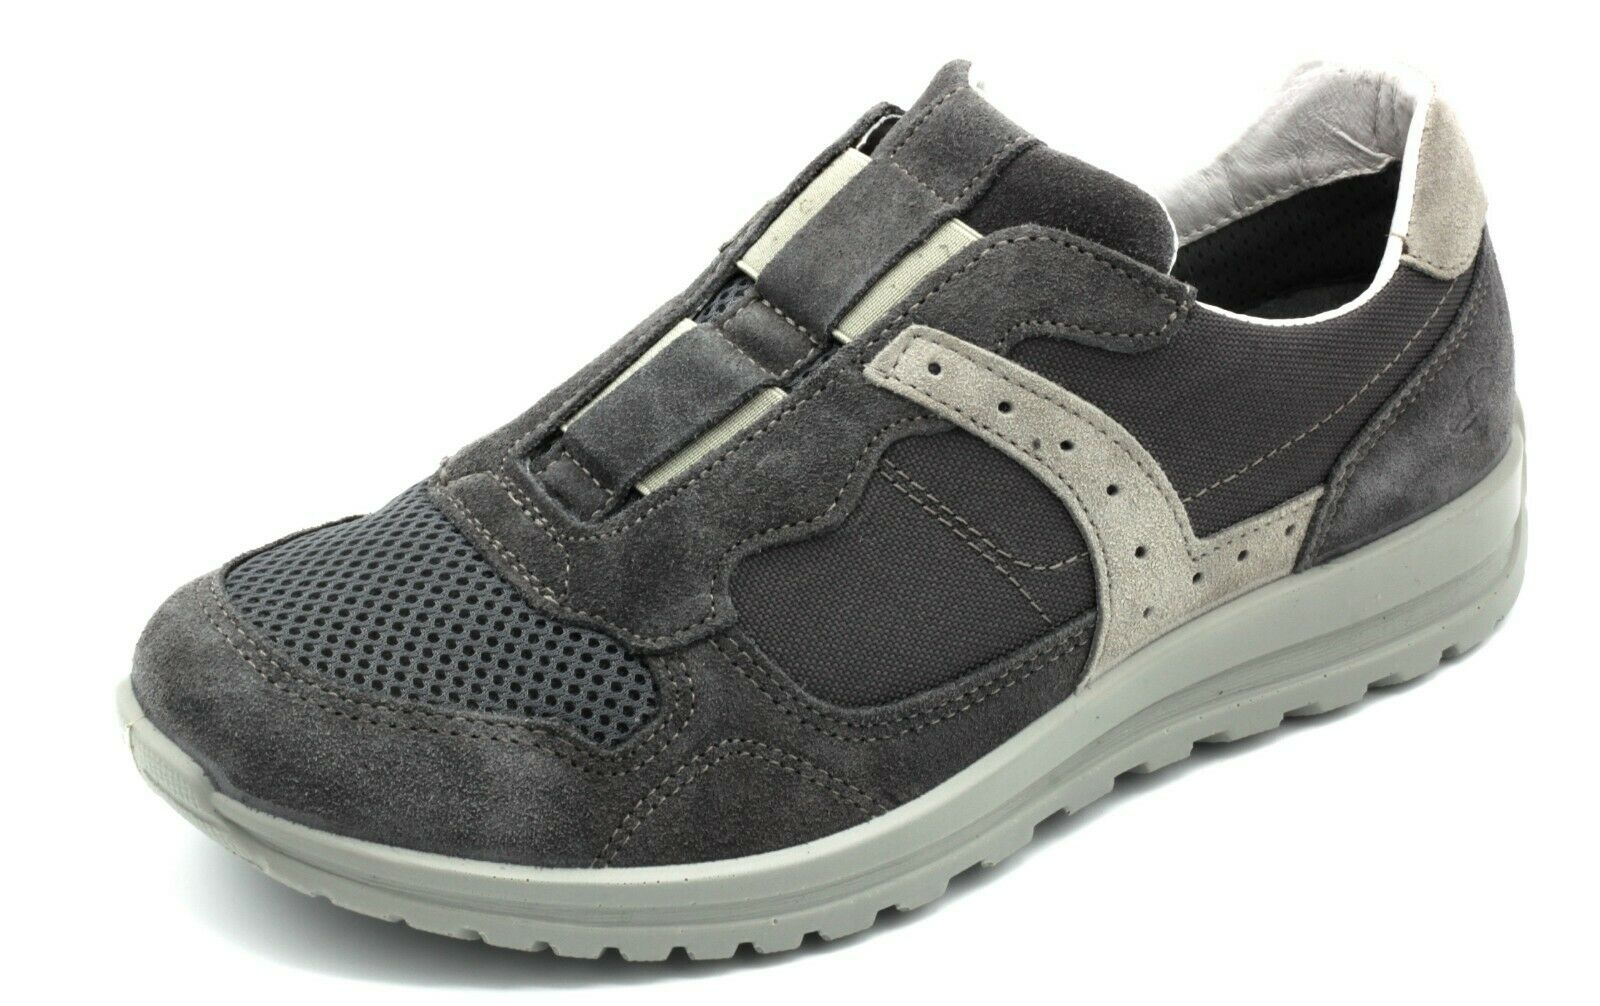 grisPORT zapatos hombres ANTISTATICA CASUAL TEMPO LIBERO PELLE NABUK gris n. 39